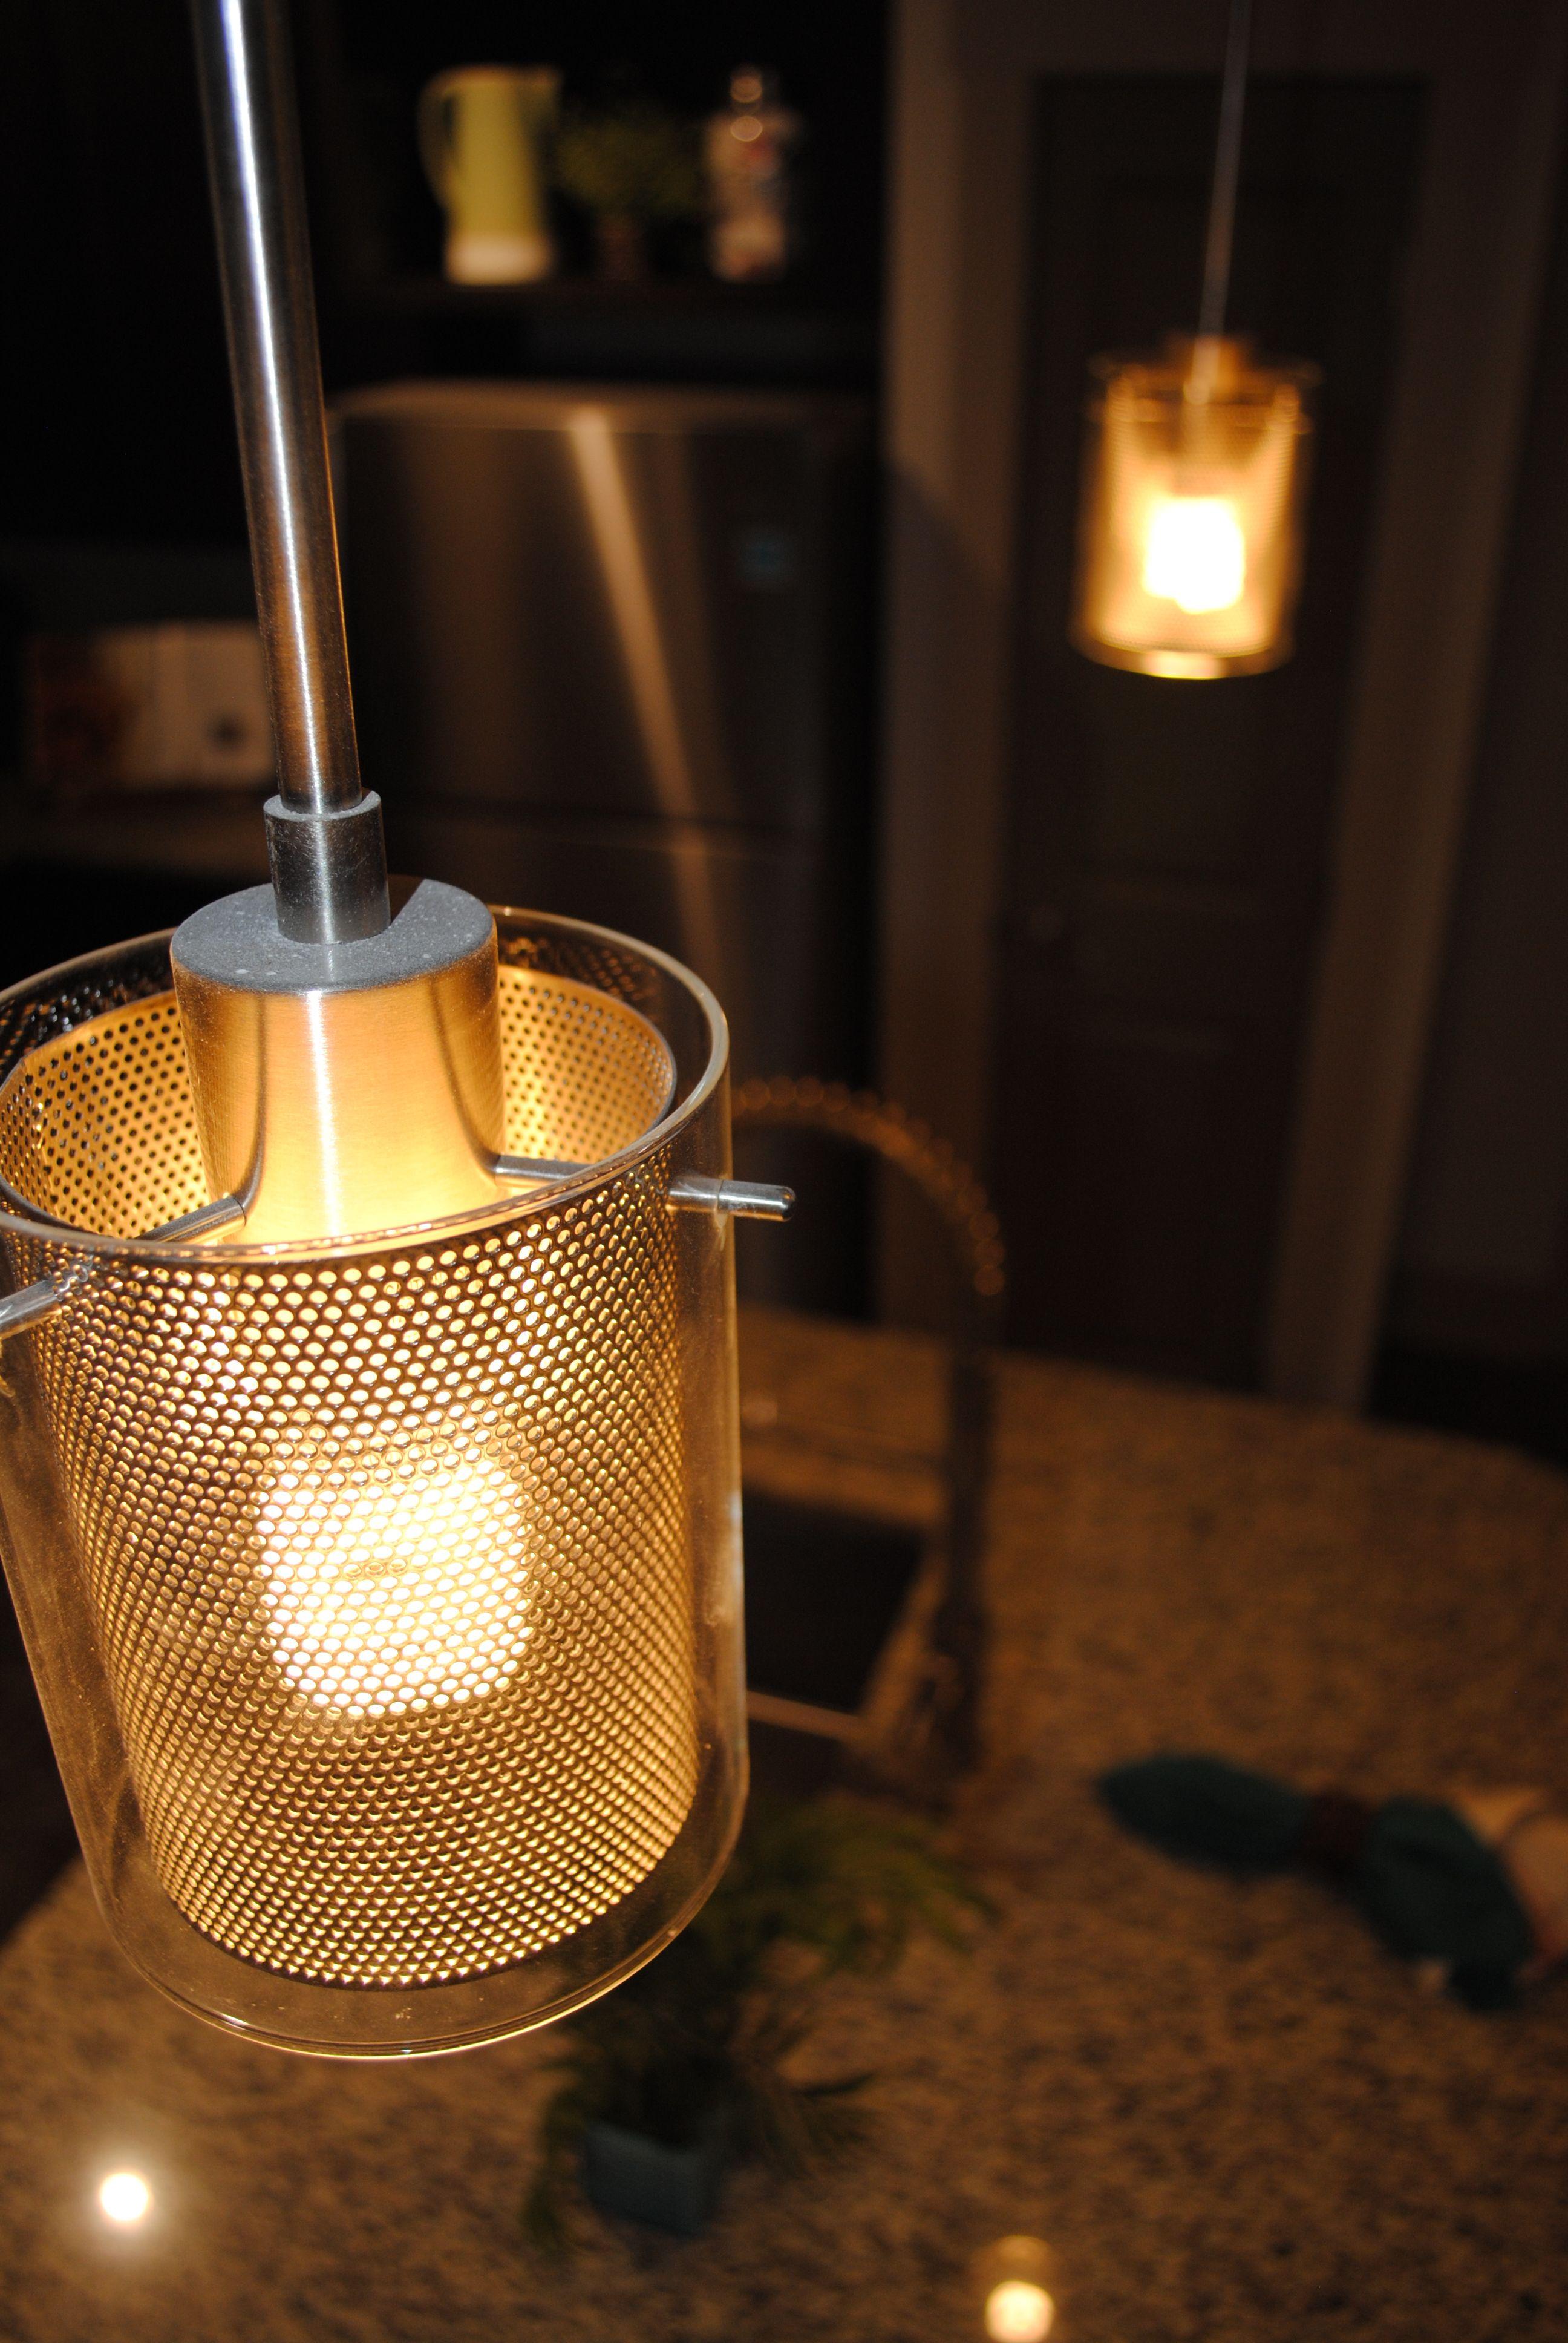 Designer Bar Lights Over A Granite Counter Kitchen Island, Included